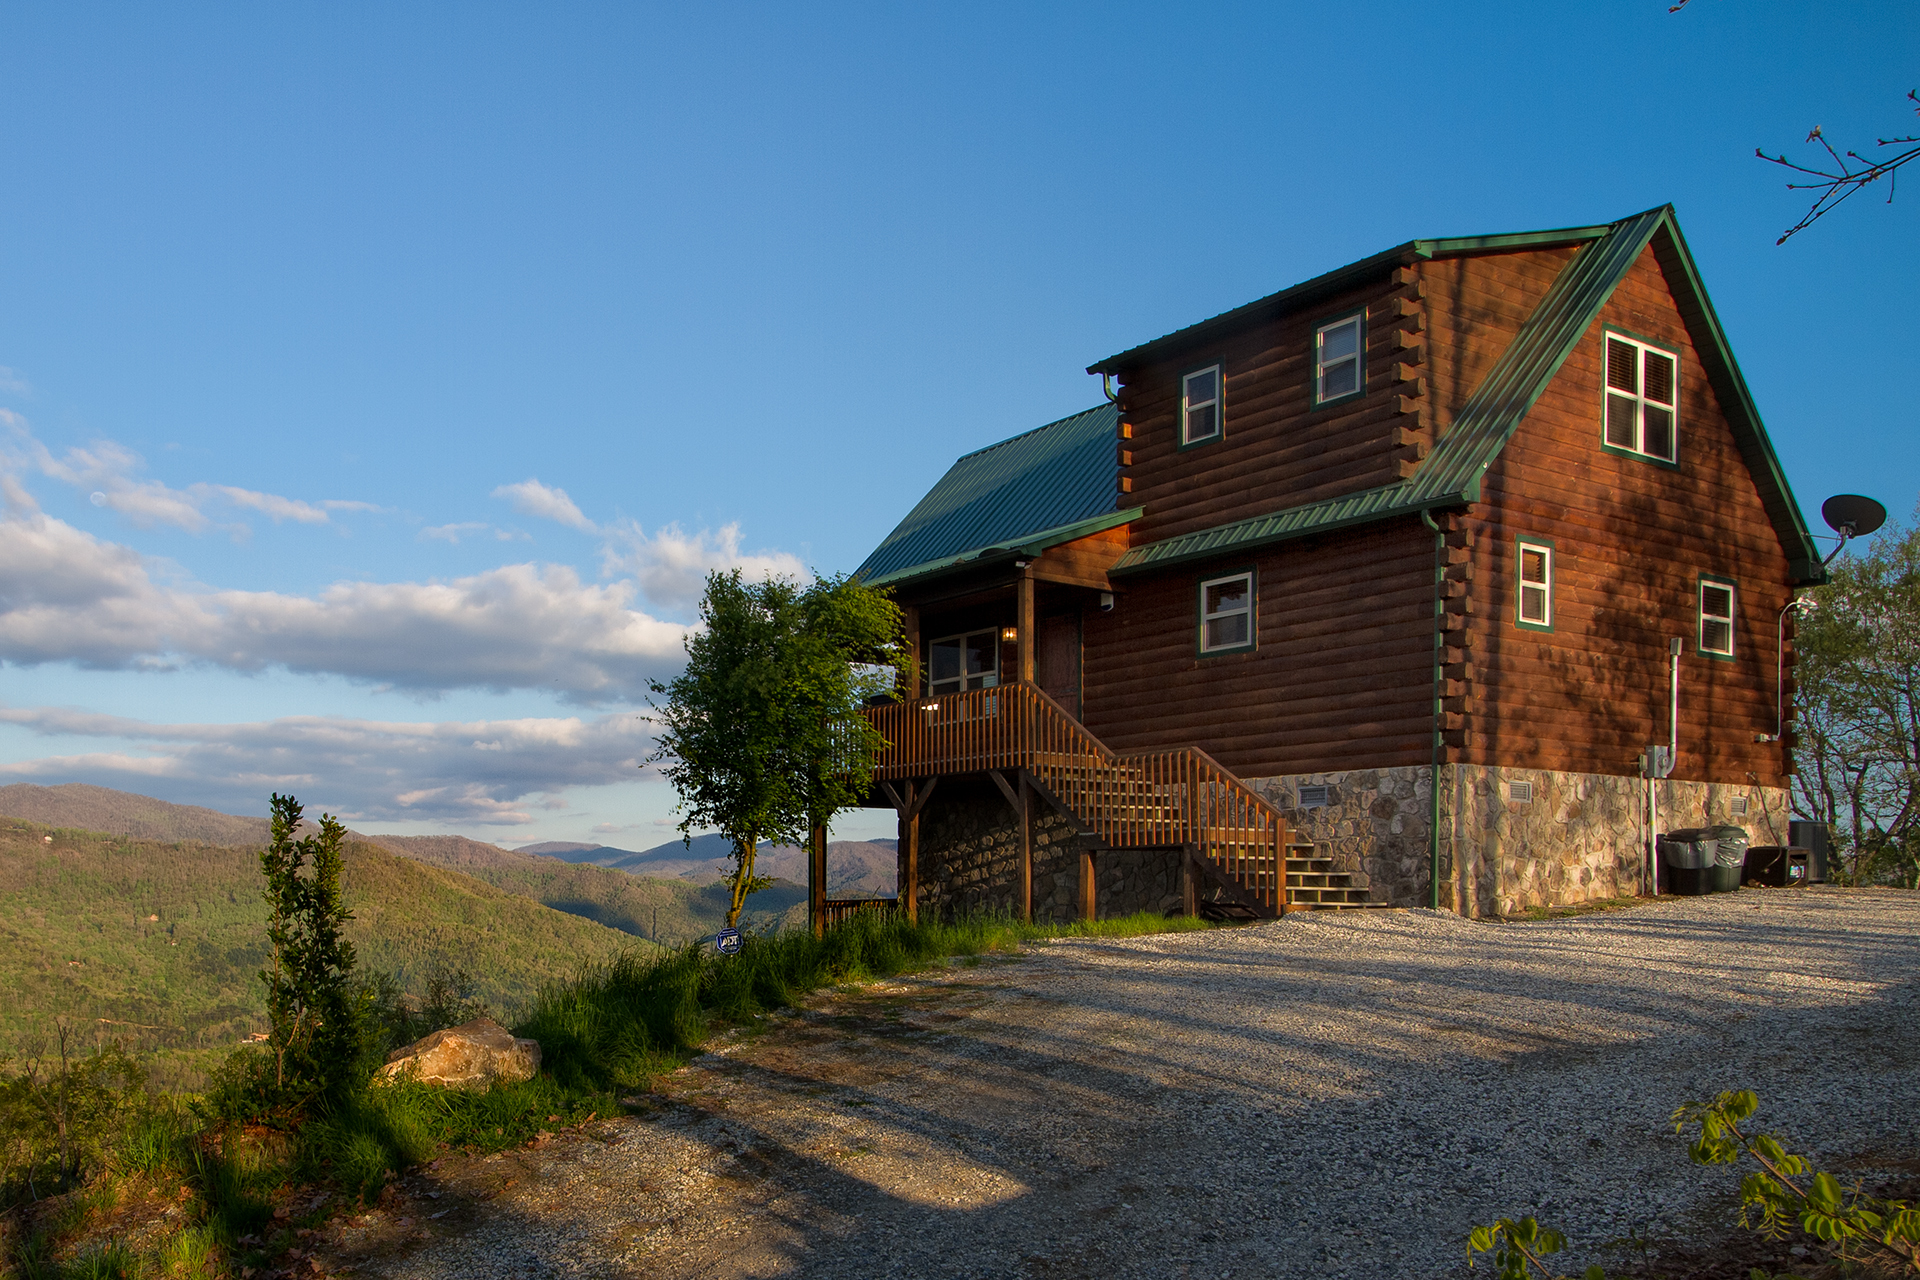 Heavenly View Smoky Mountain Log Cabin 2 Bedroom Info By Carolina